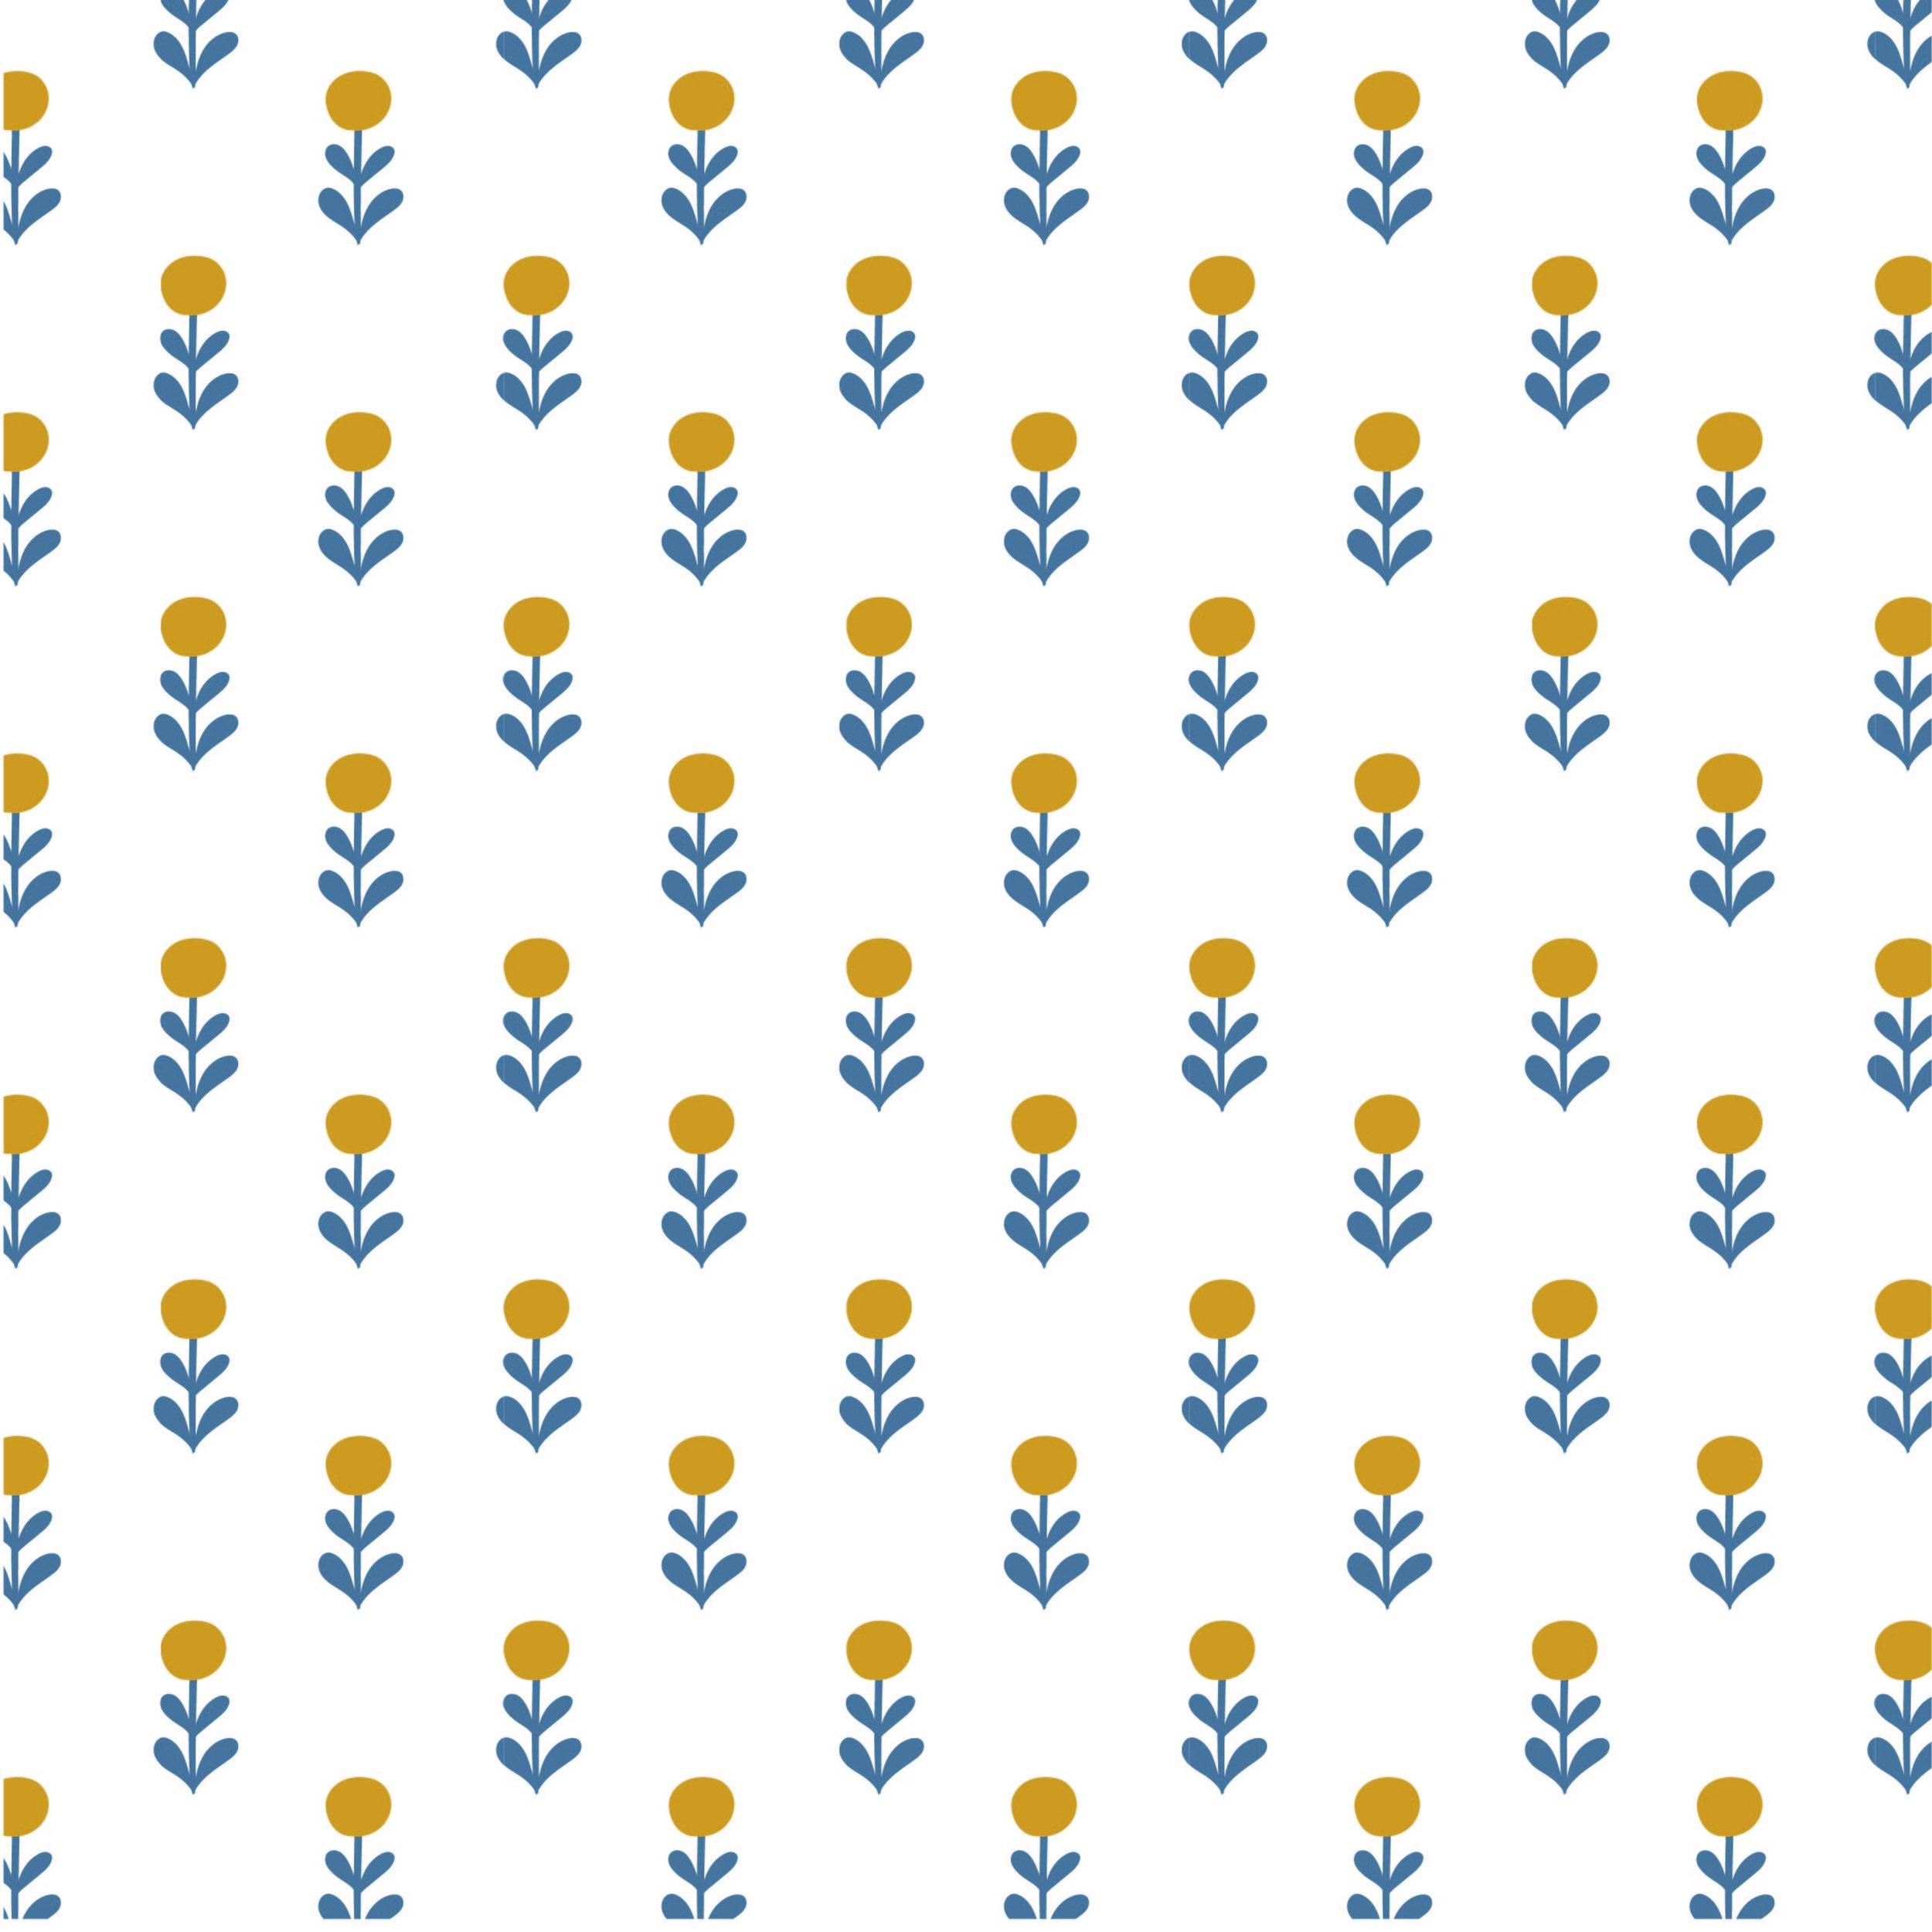 patterns for texas-23.jpg